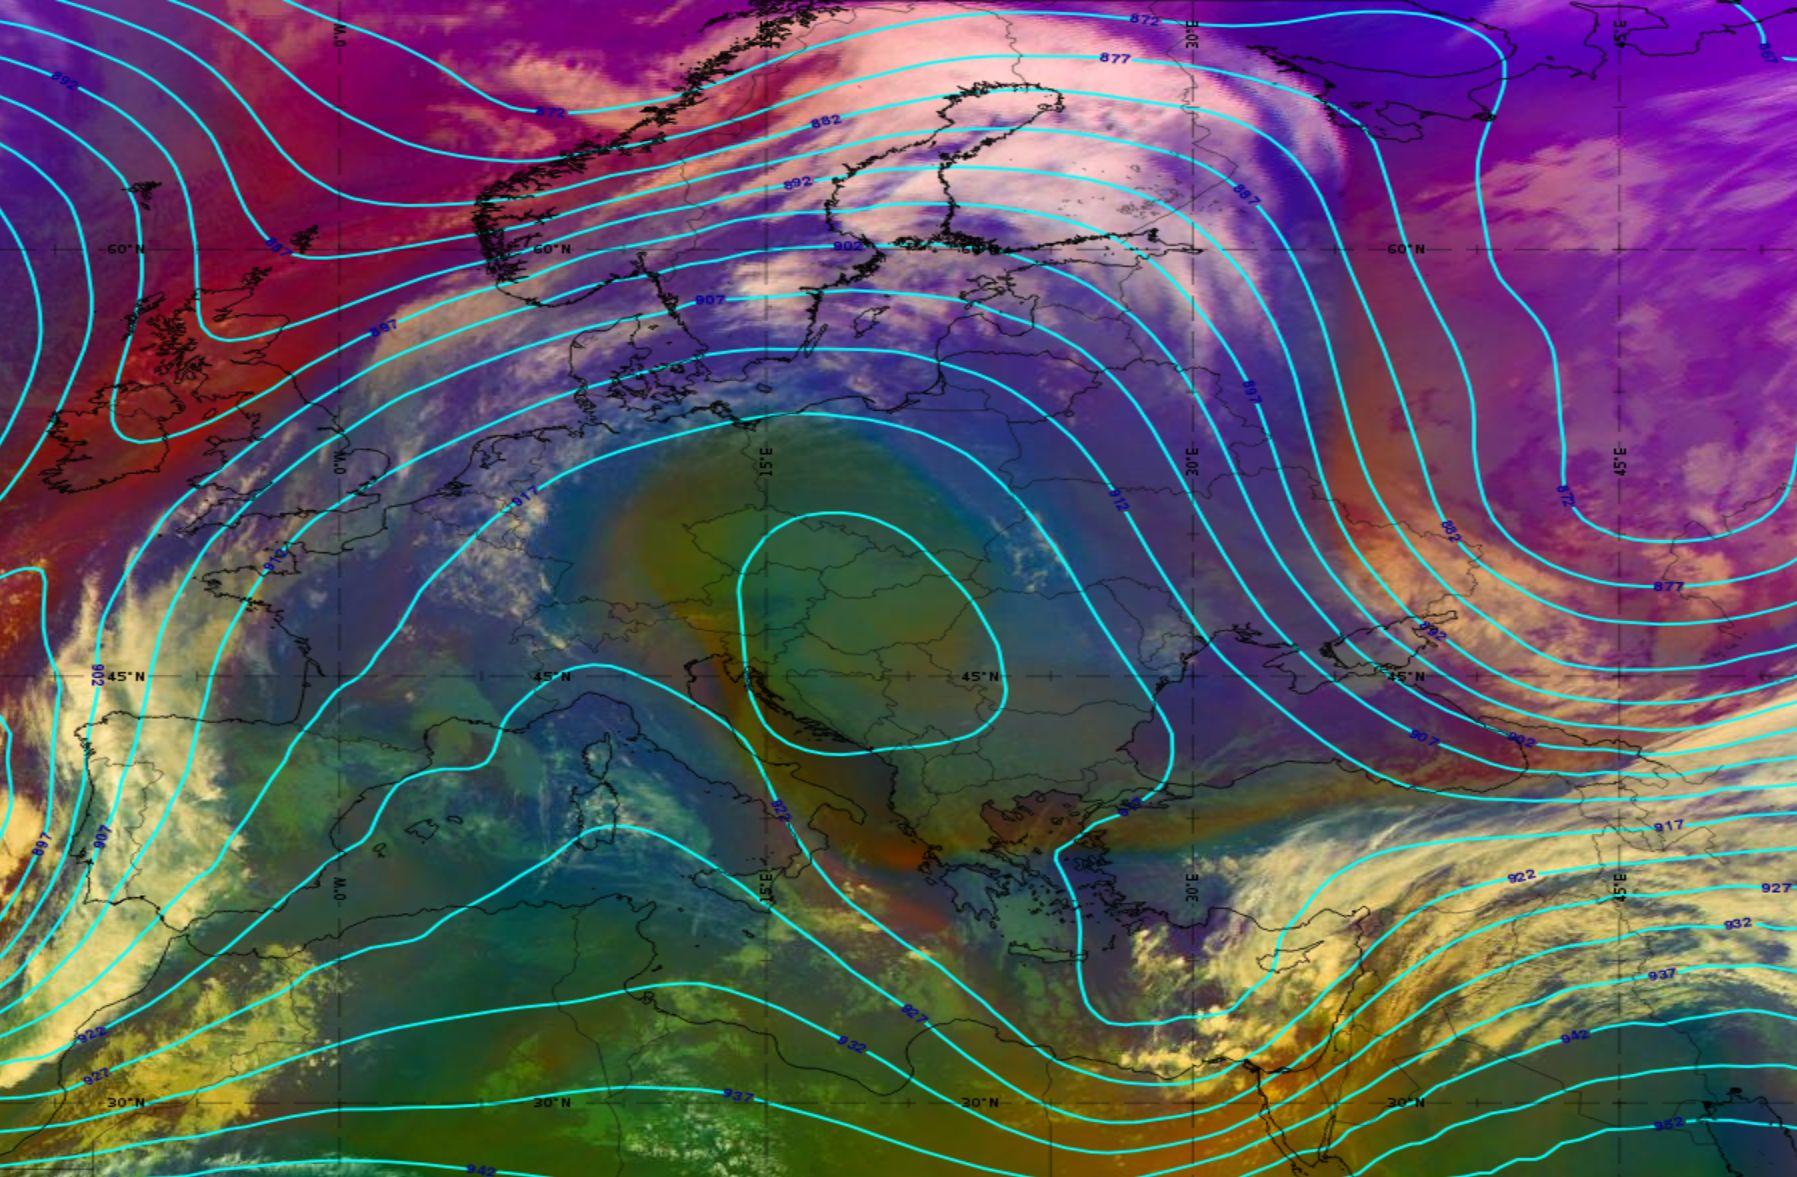 Meteosat-11 Airmass RGB image, overlaid with 300 hPa height, 25 November 2020, 15:00 UTC